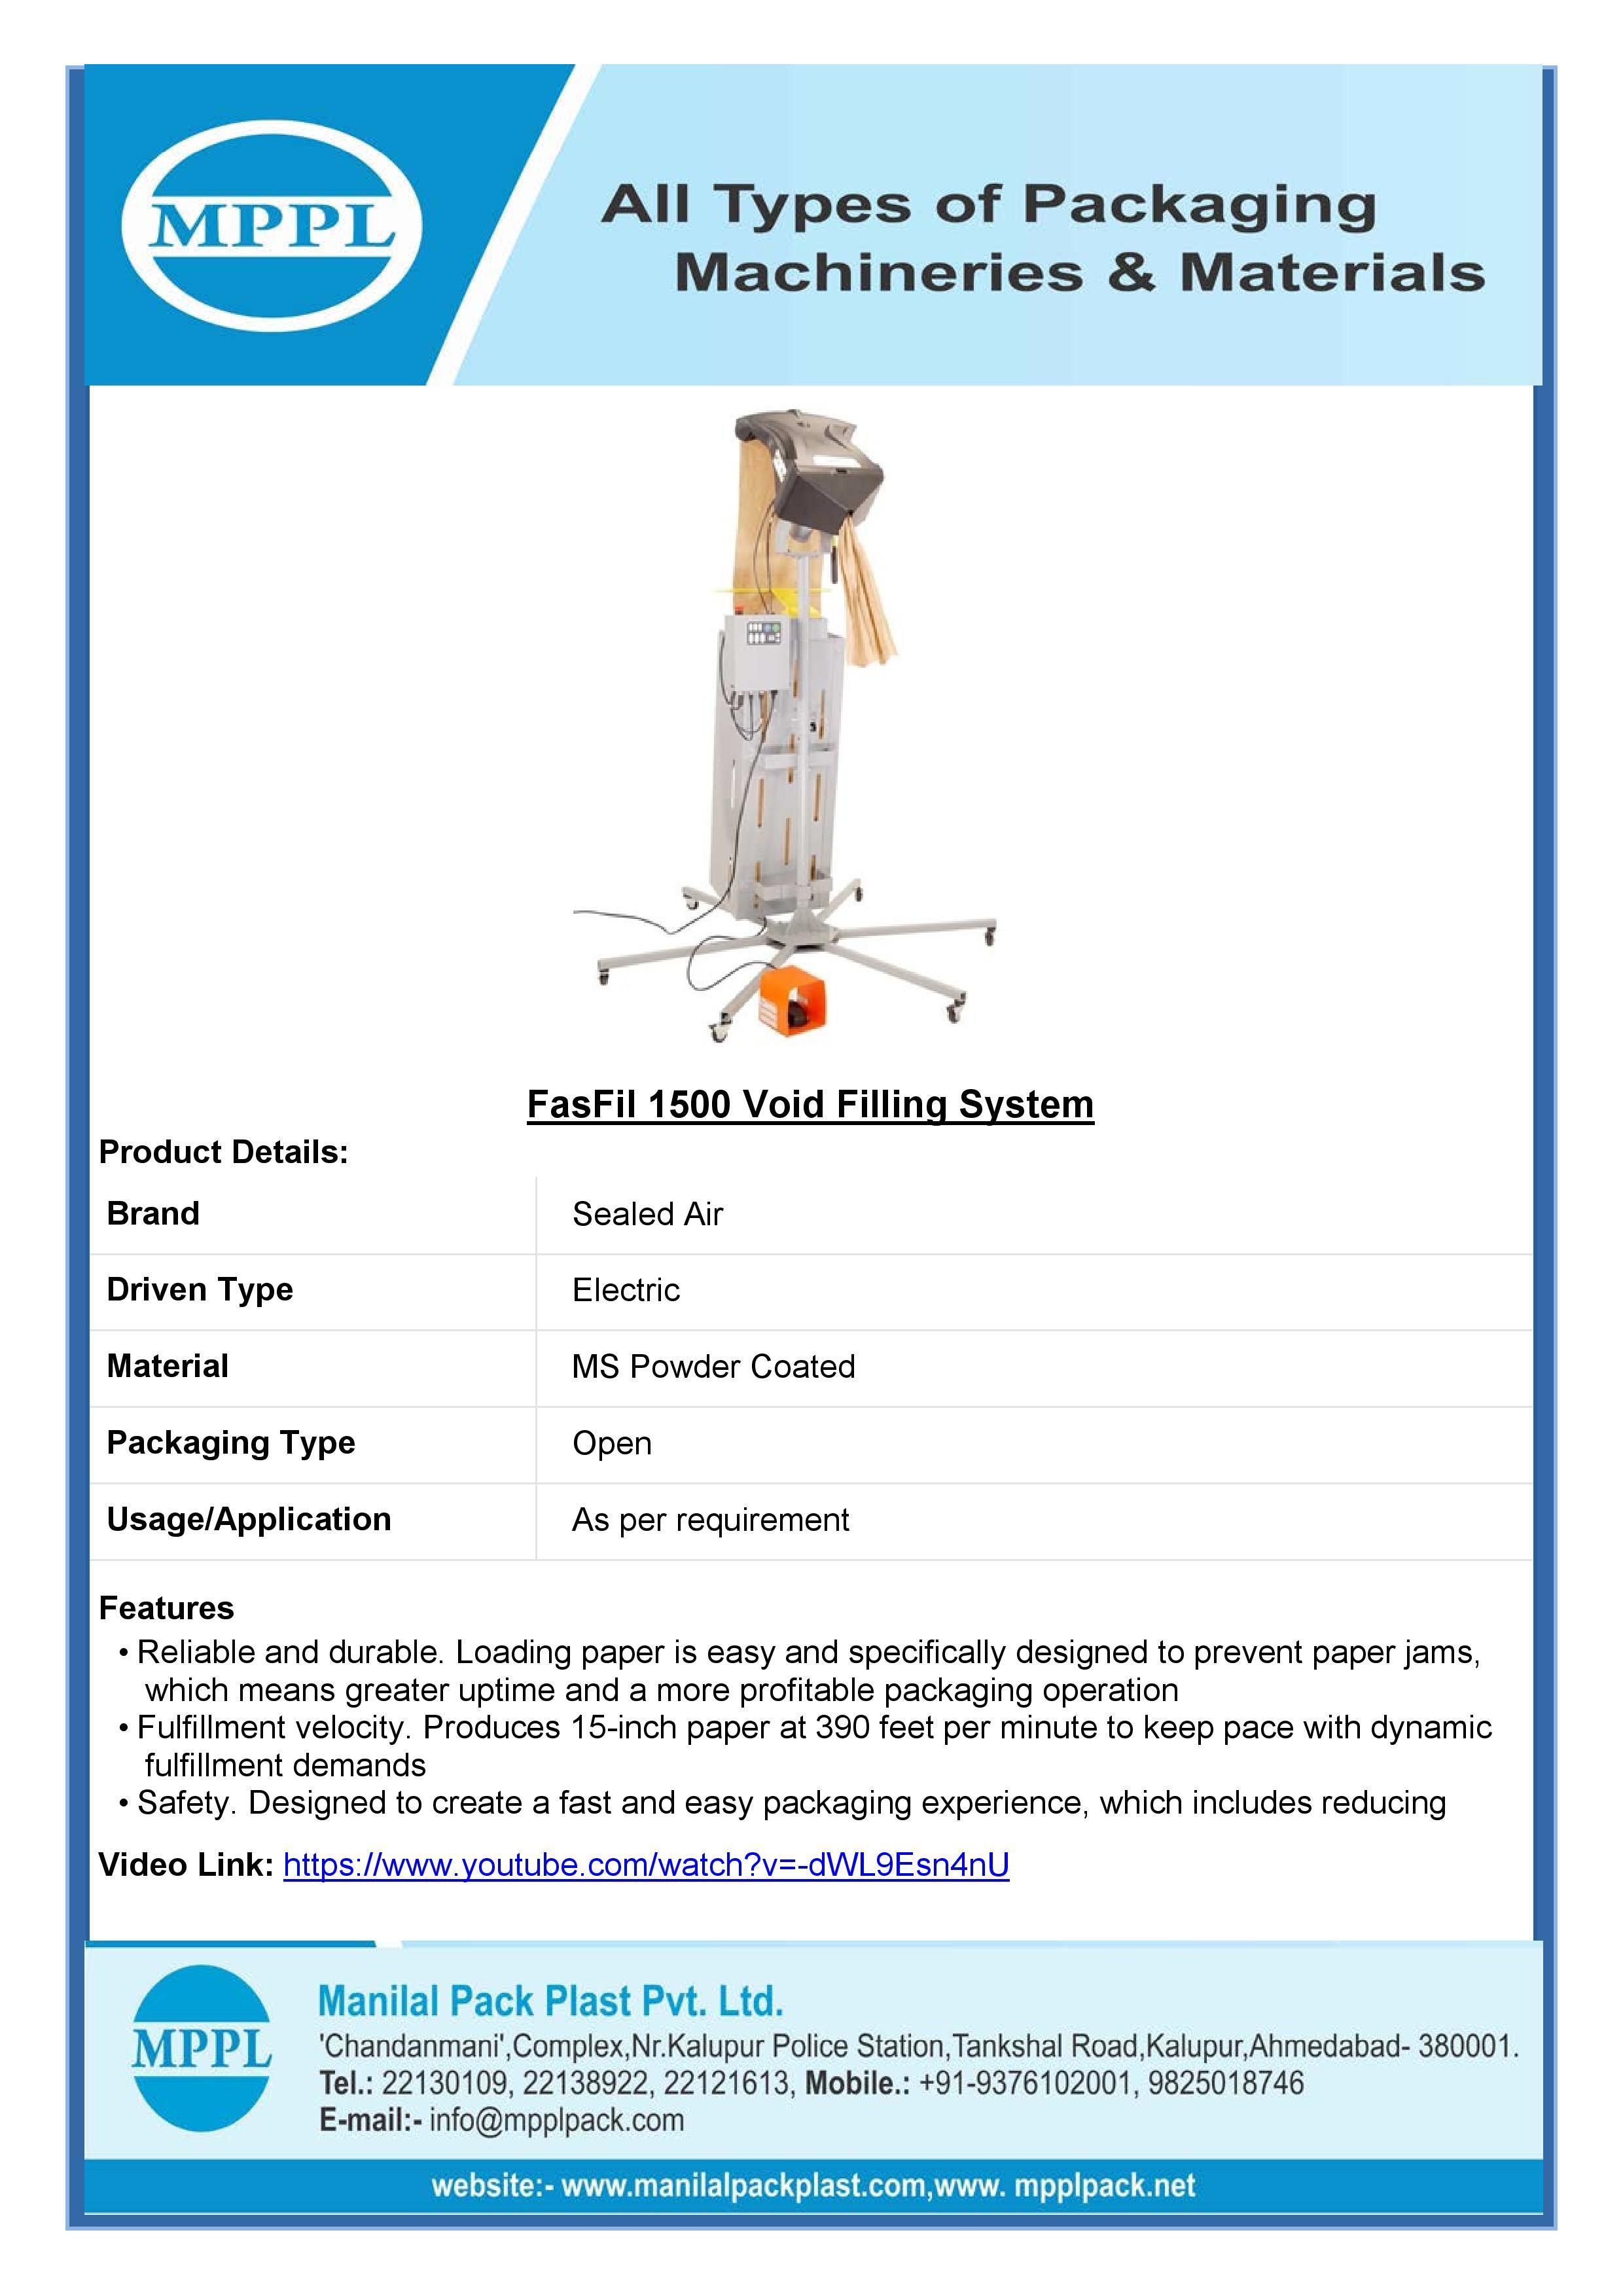 FasFil 1500 Void Filling System